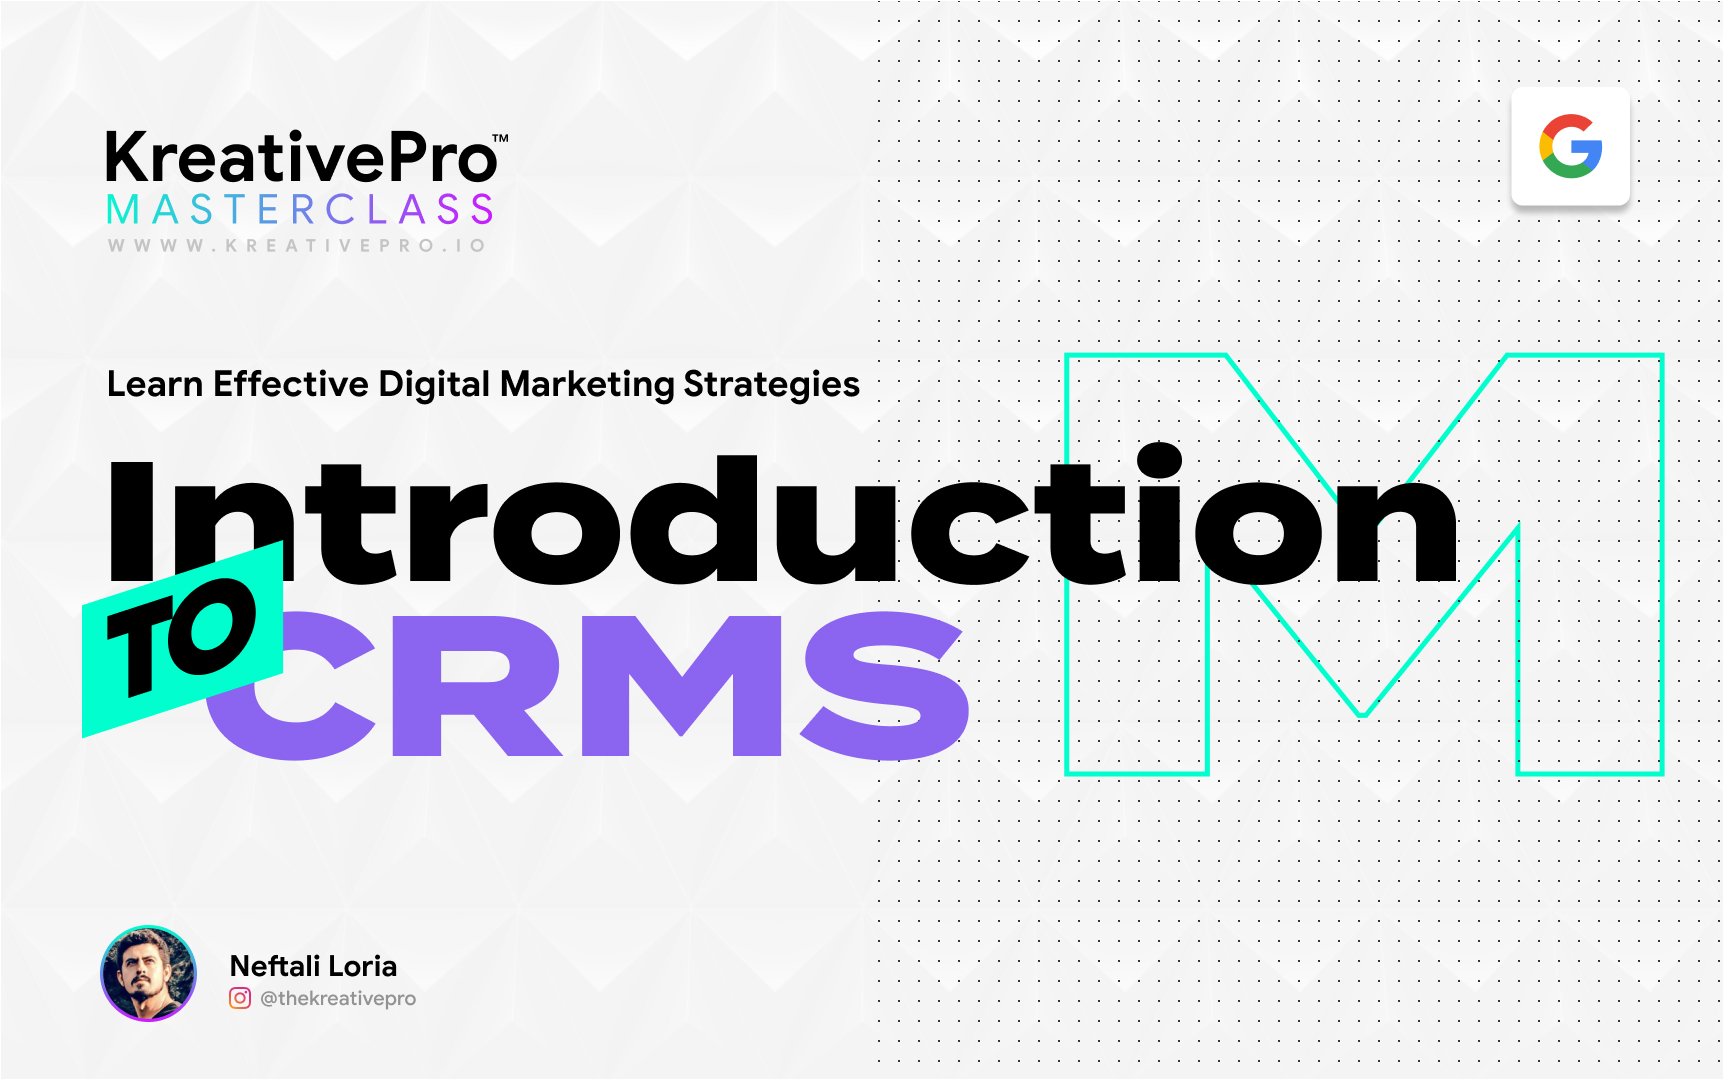 Marketing 2.1 - Intro to CRMs